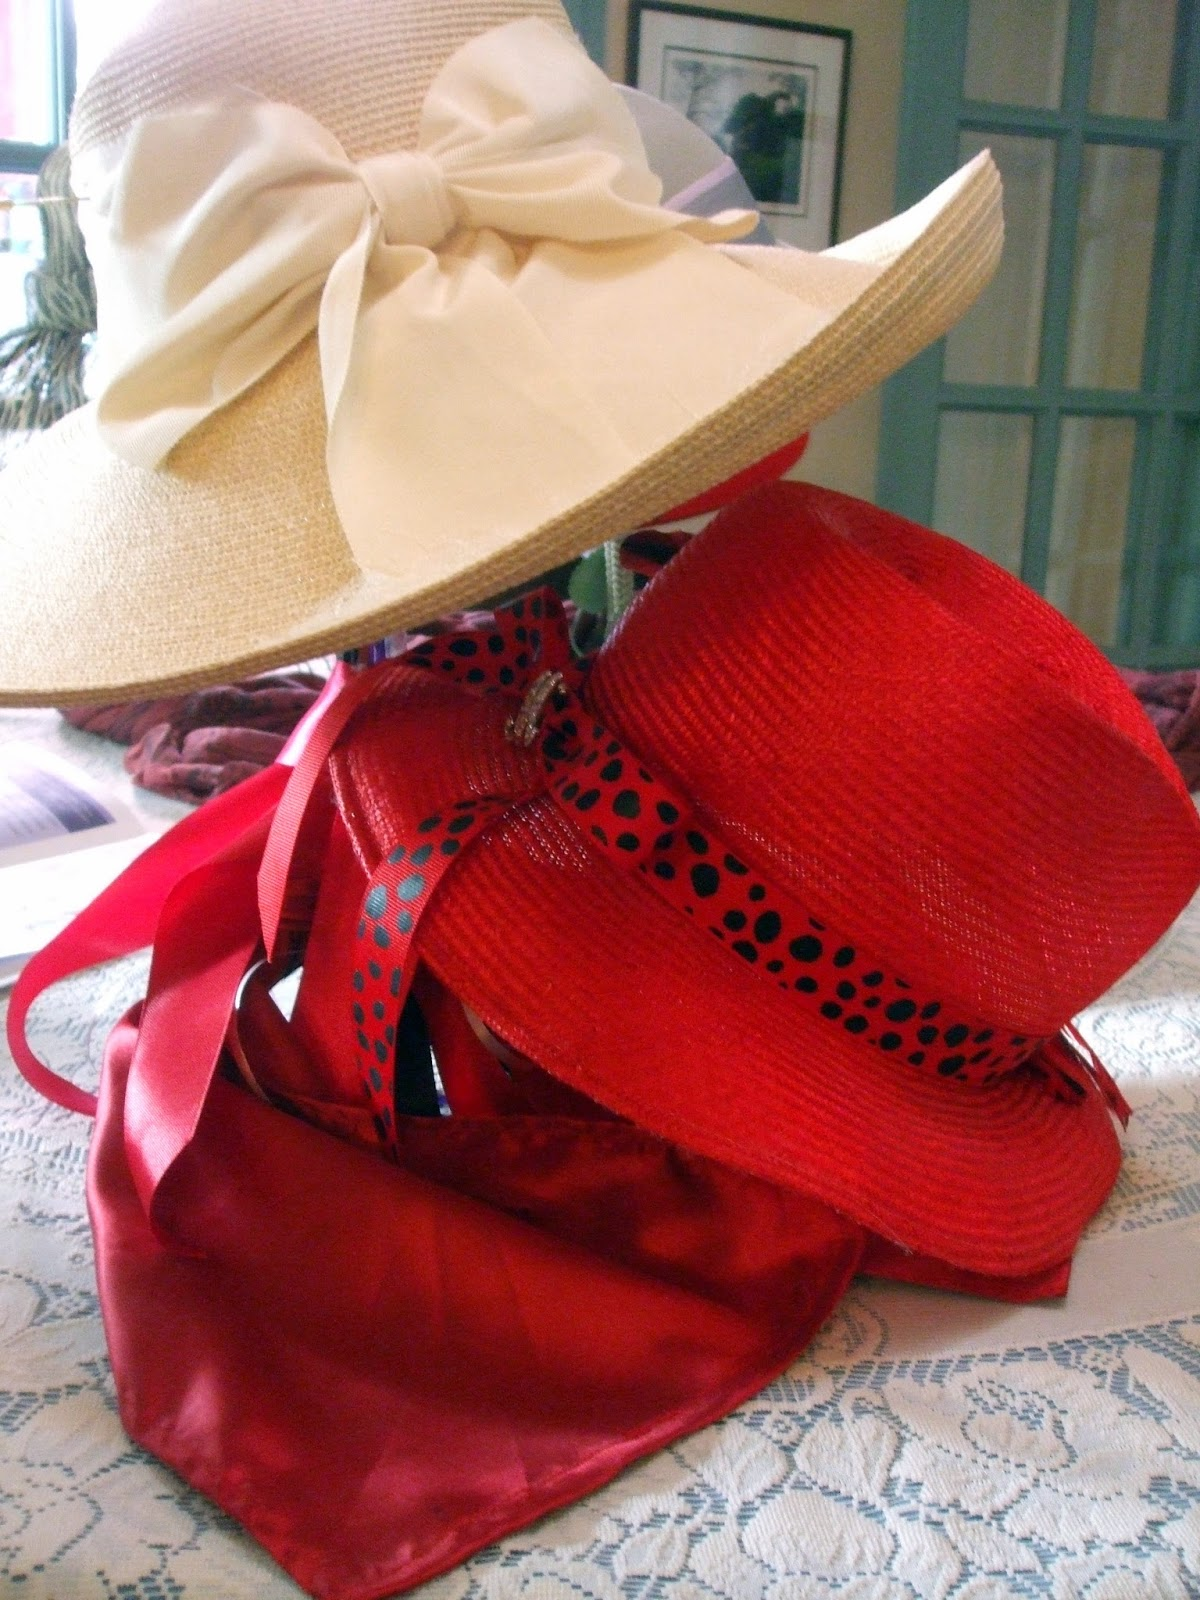 http://therosemaryhouse.blogspot.com/2012/08/the-tea-and-hat-lady.html